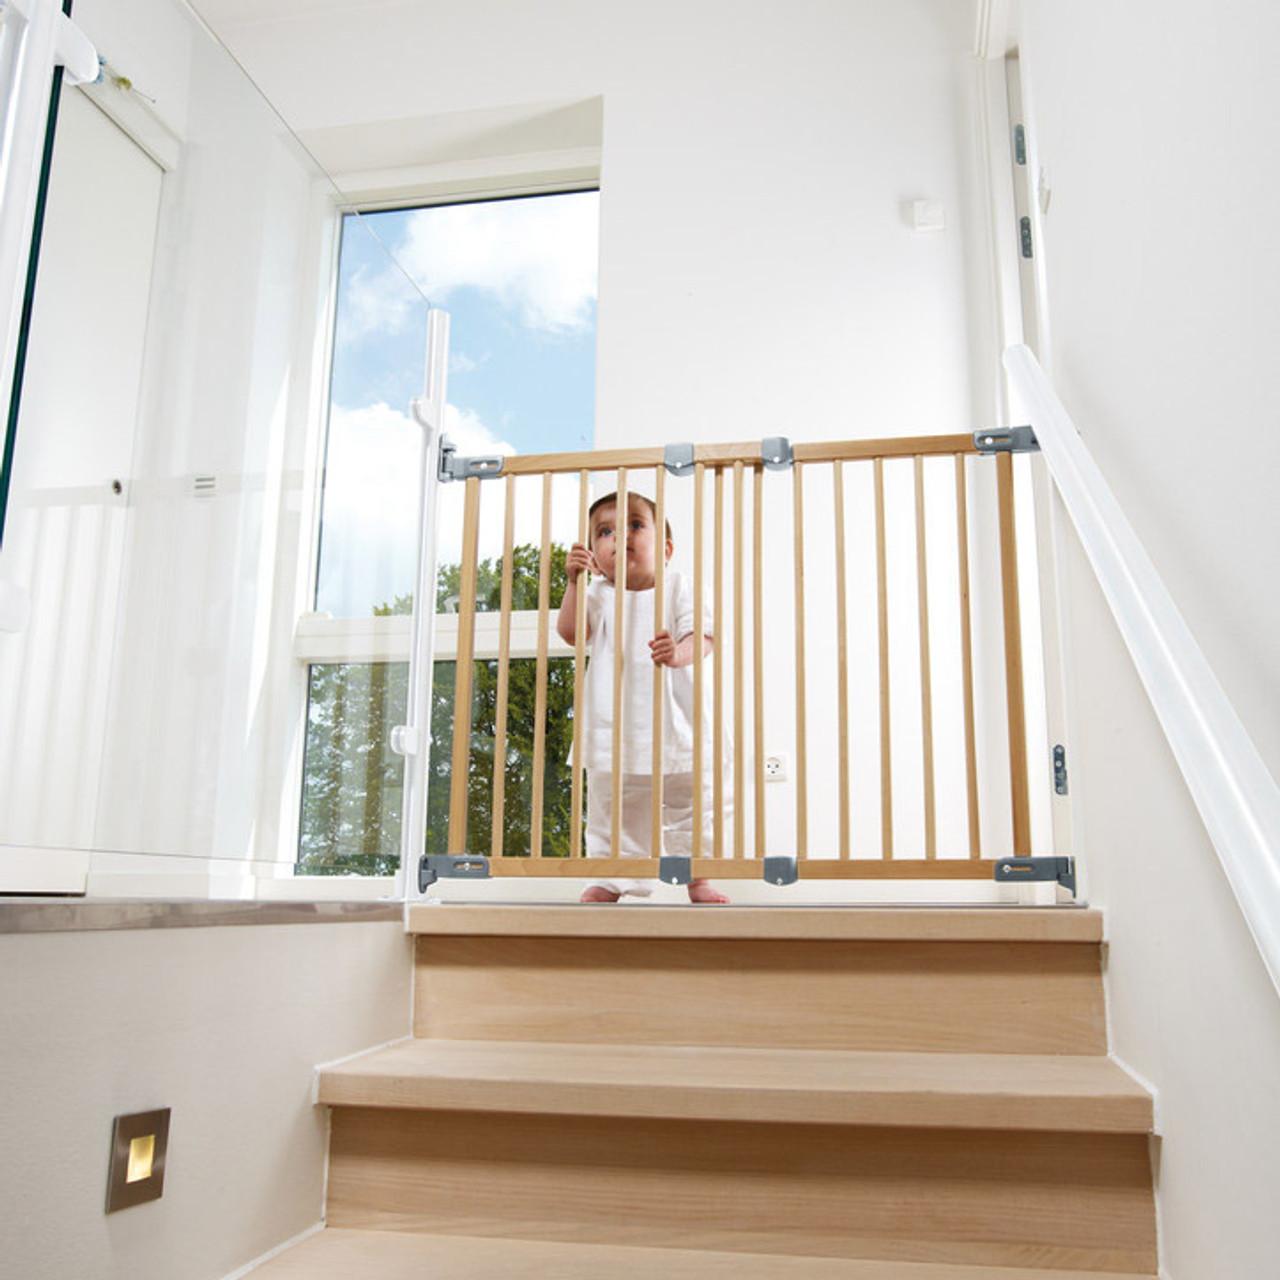 BabyDan Flexi Fit Wooden Stair Gate (69   106.5 Cm)